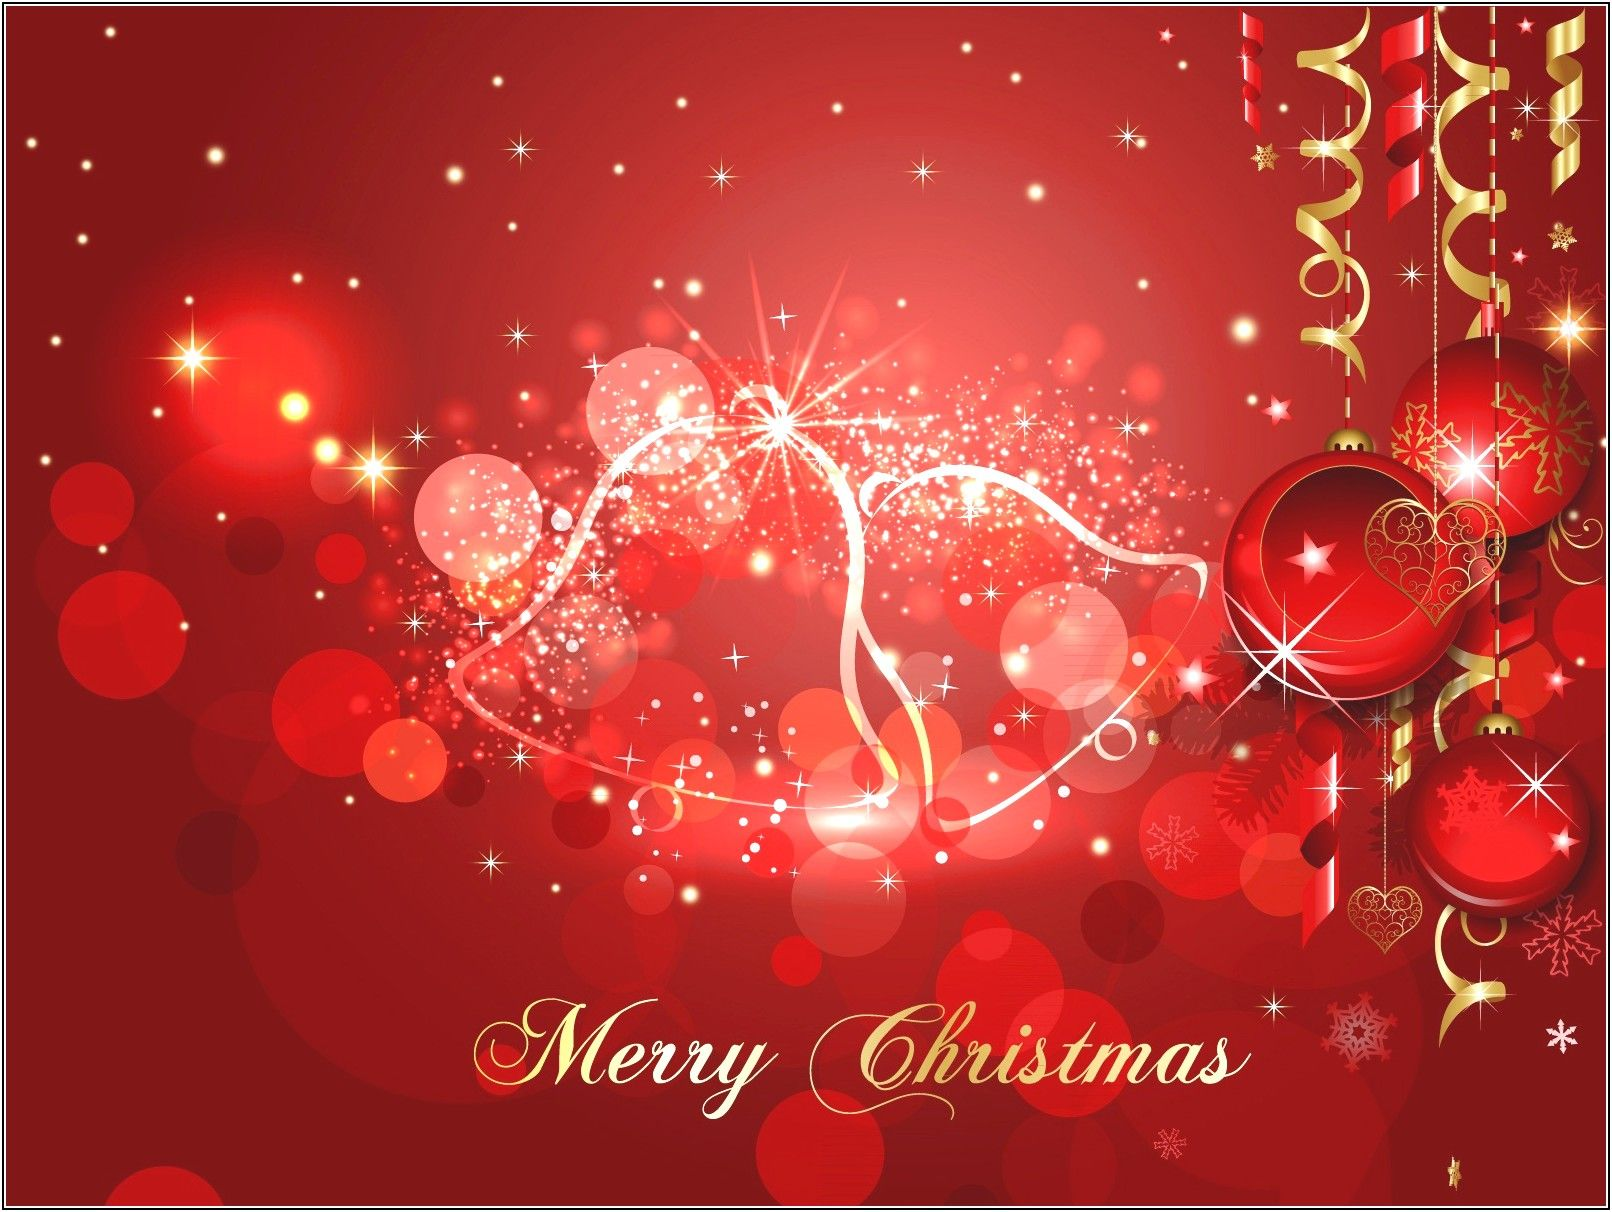 Beautiful Wallpaper Love Merry Christmas - 48431aa823ad3190deaffd8173d98b85  Gallery_732111.jpg